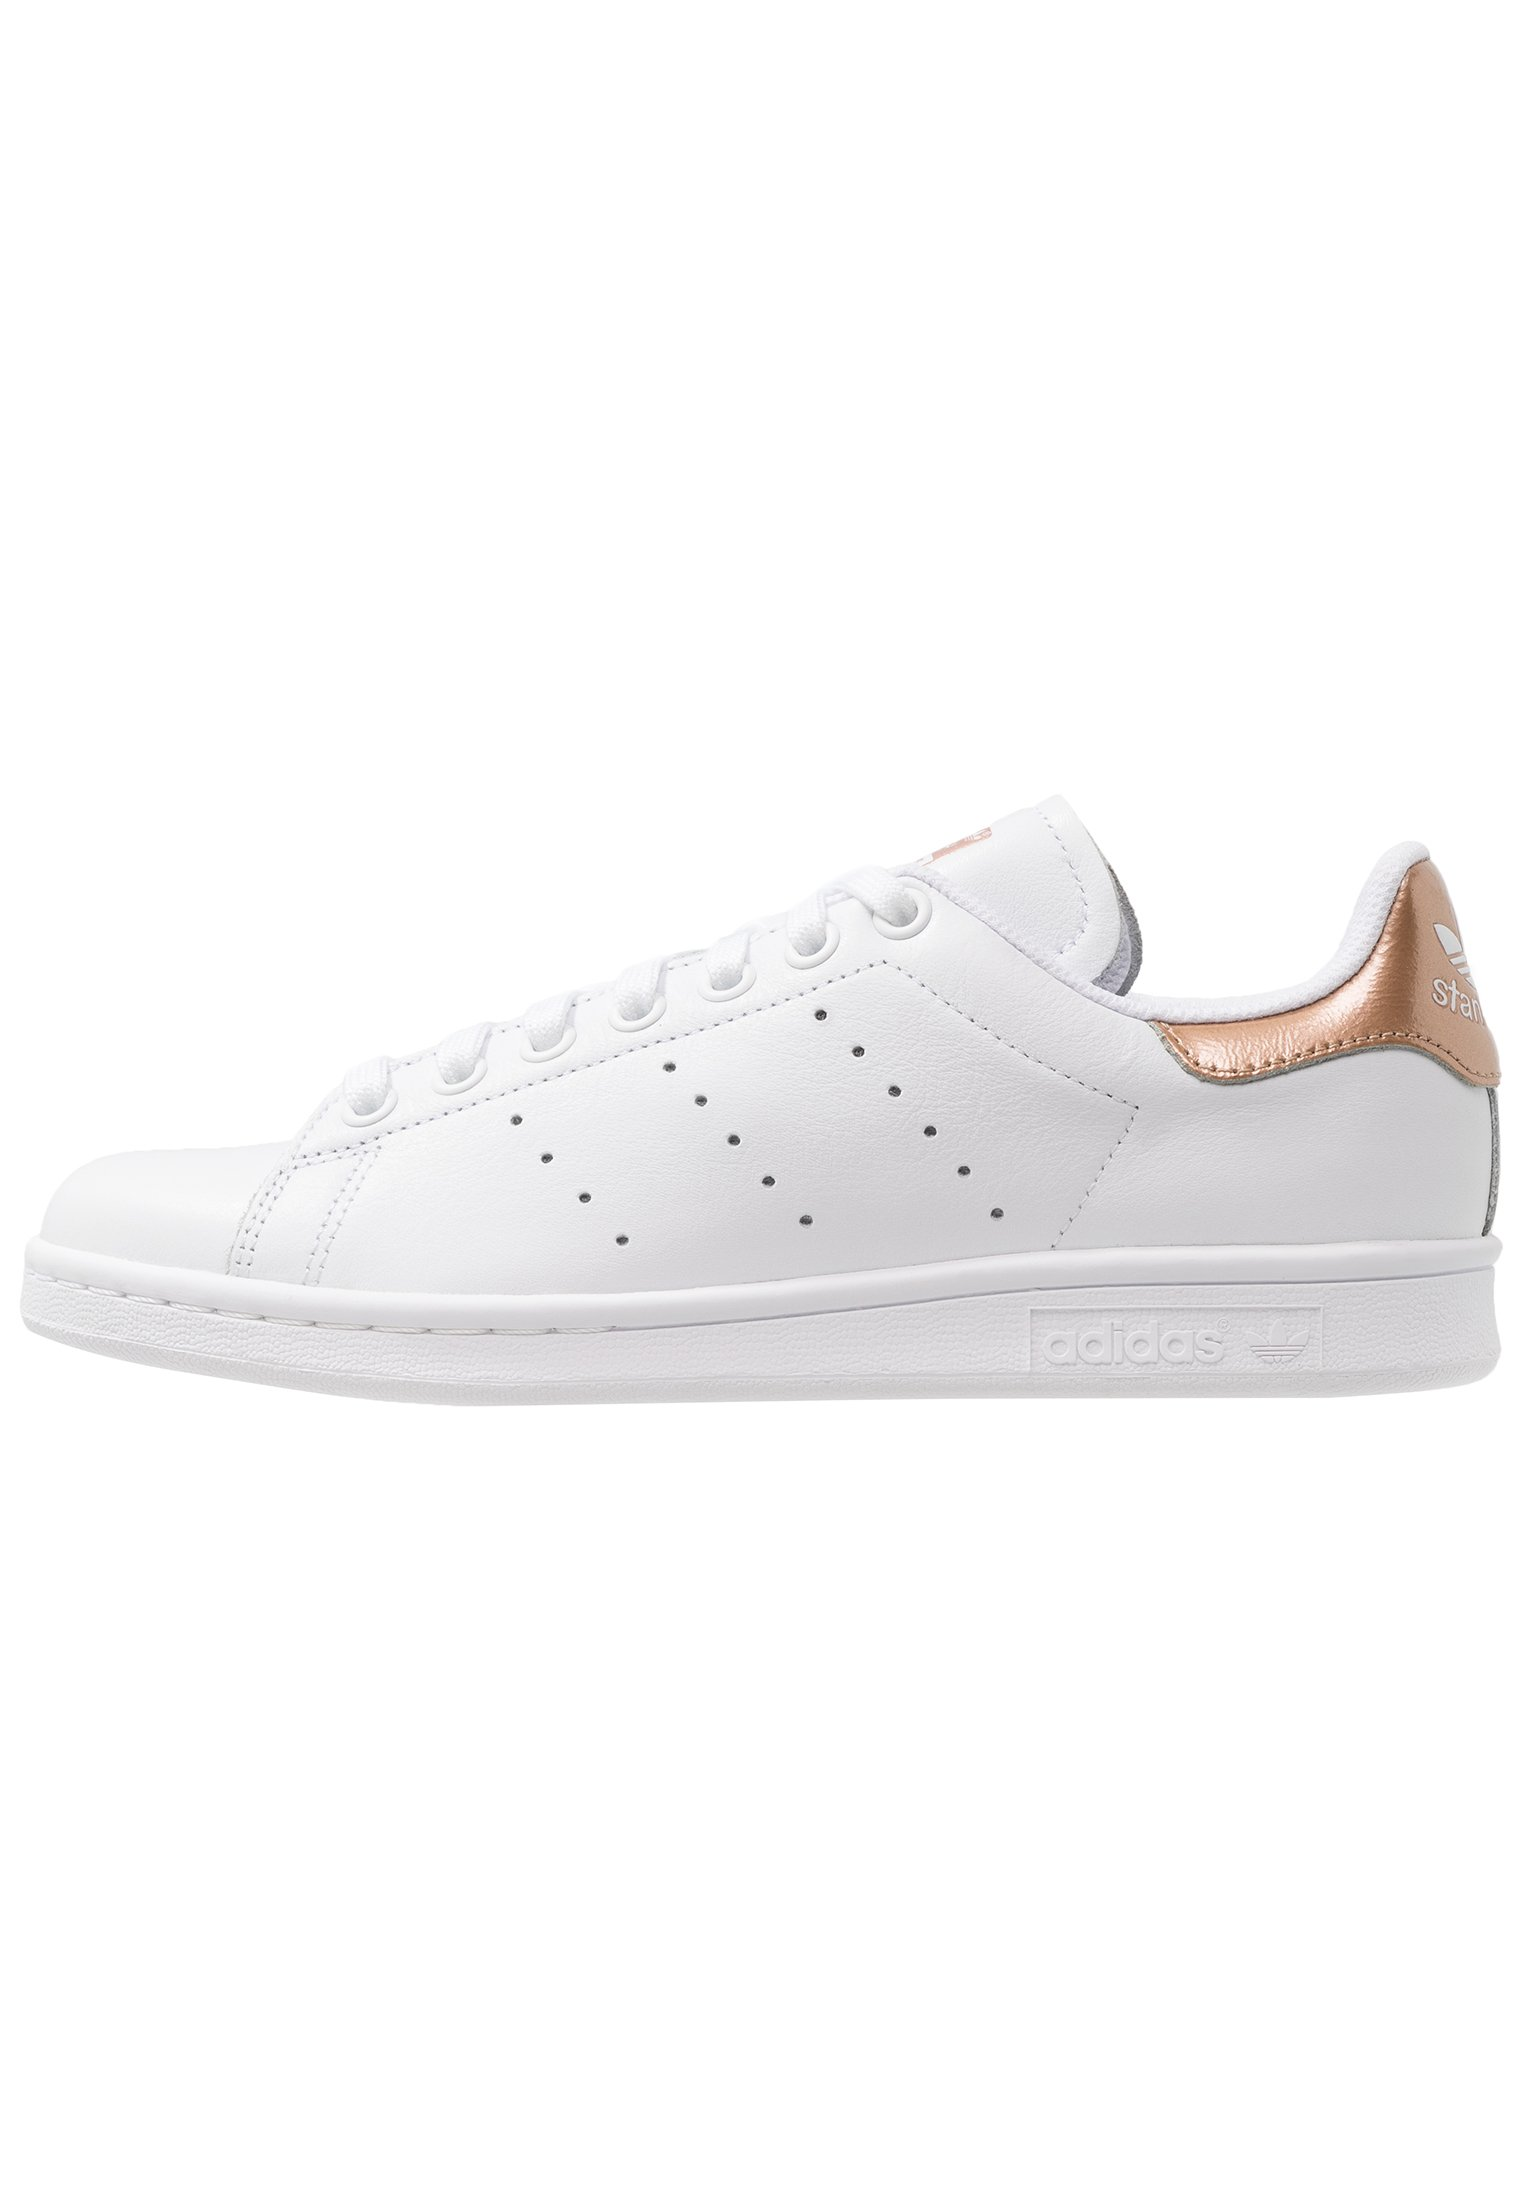 adidas Originals STAN SMITH Baskets basses footwear